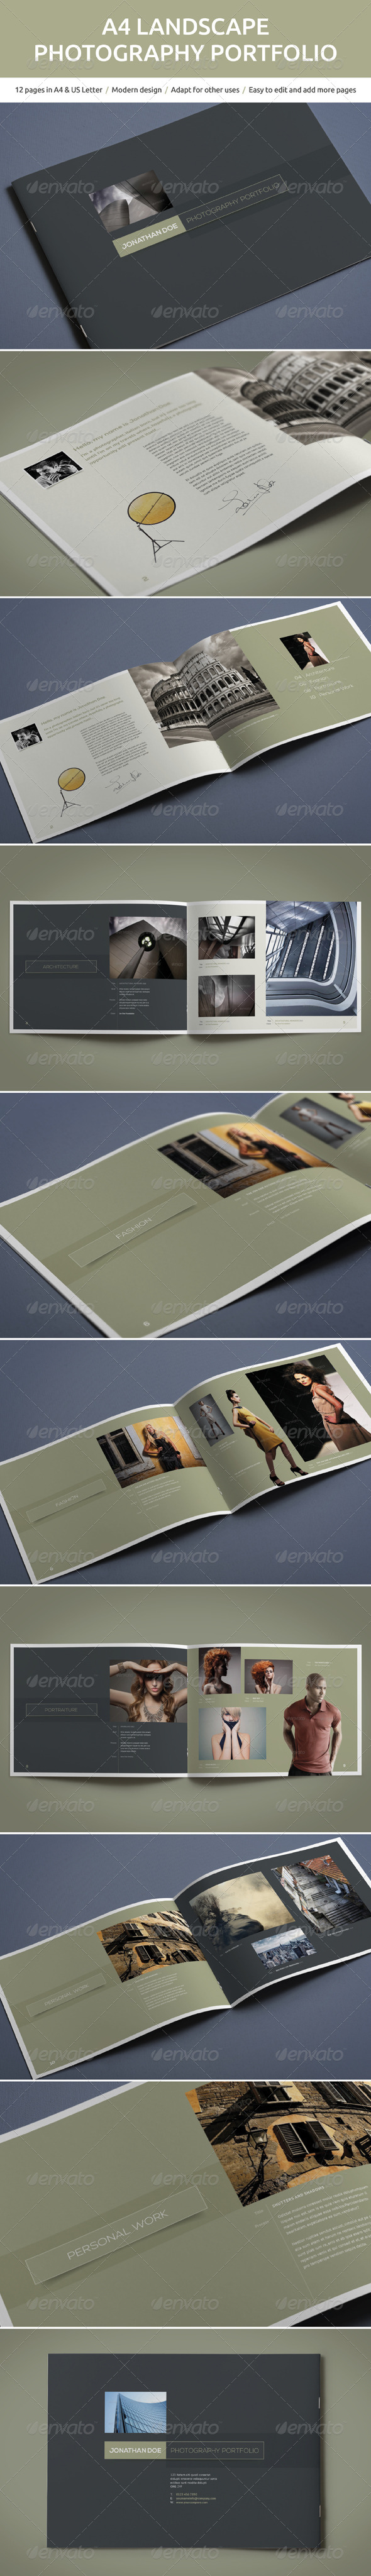 GraphicRiver A4 Landscape Photography Portfolio 5046024